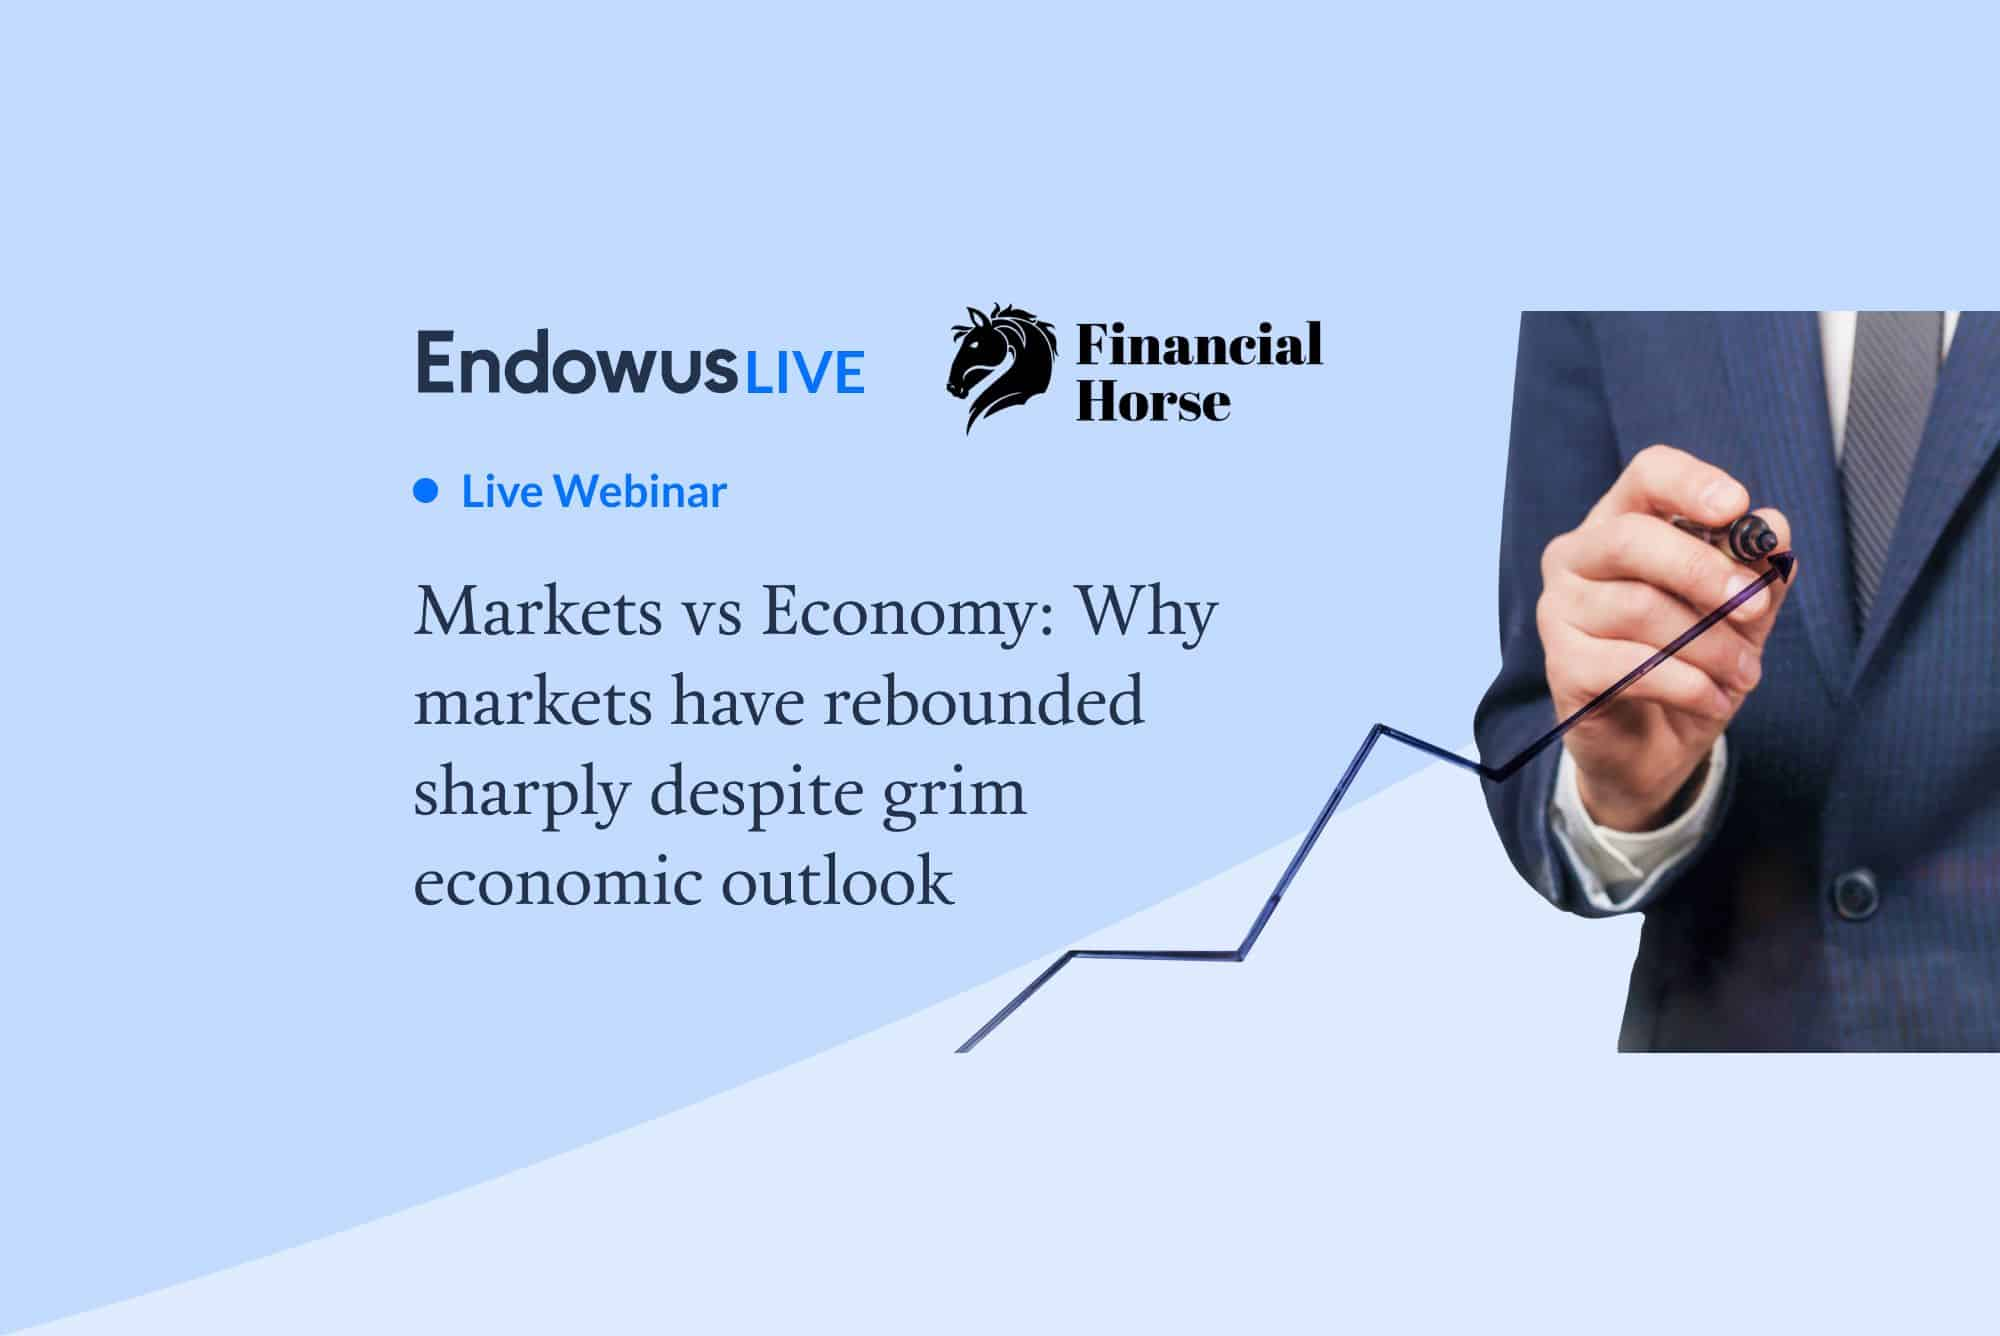 Webinar: Markets vs Economy: Why markets have rebounded sharply despite a grim economic outlook